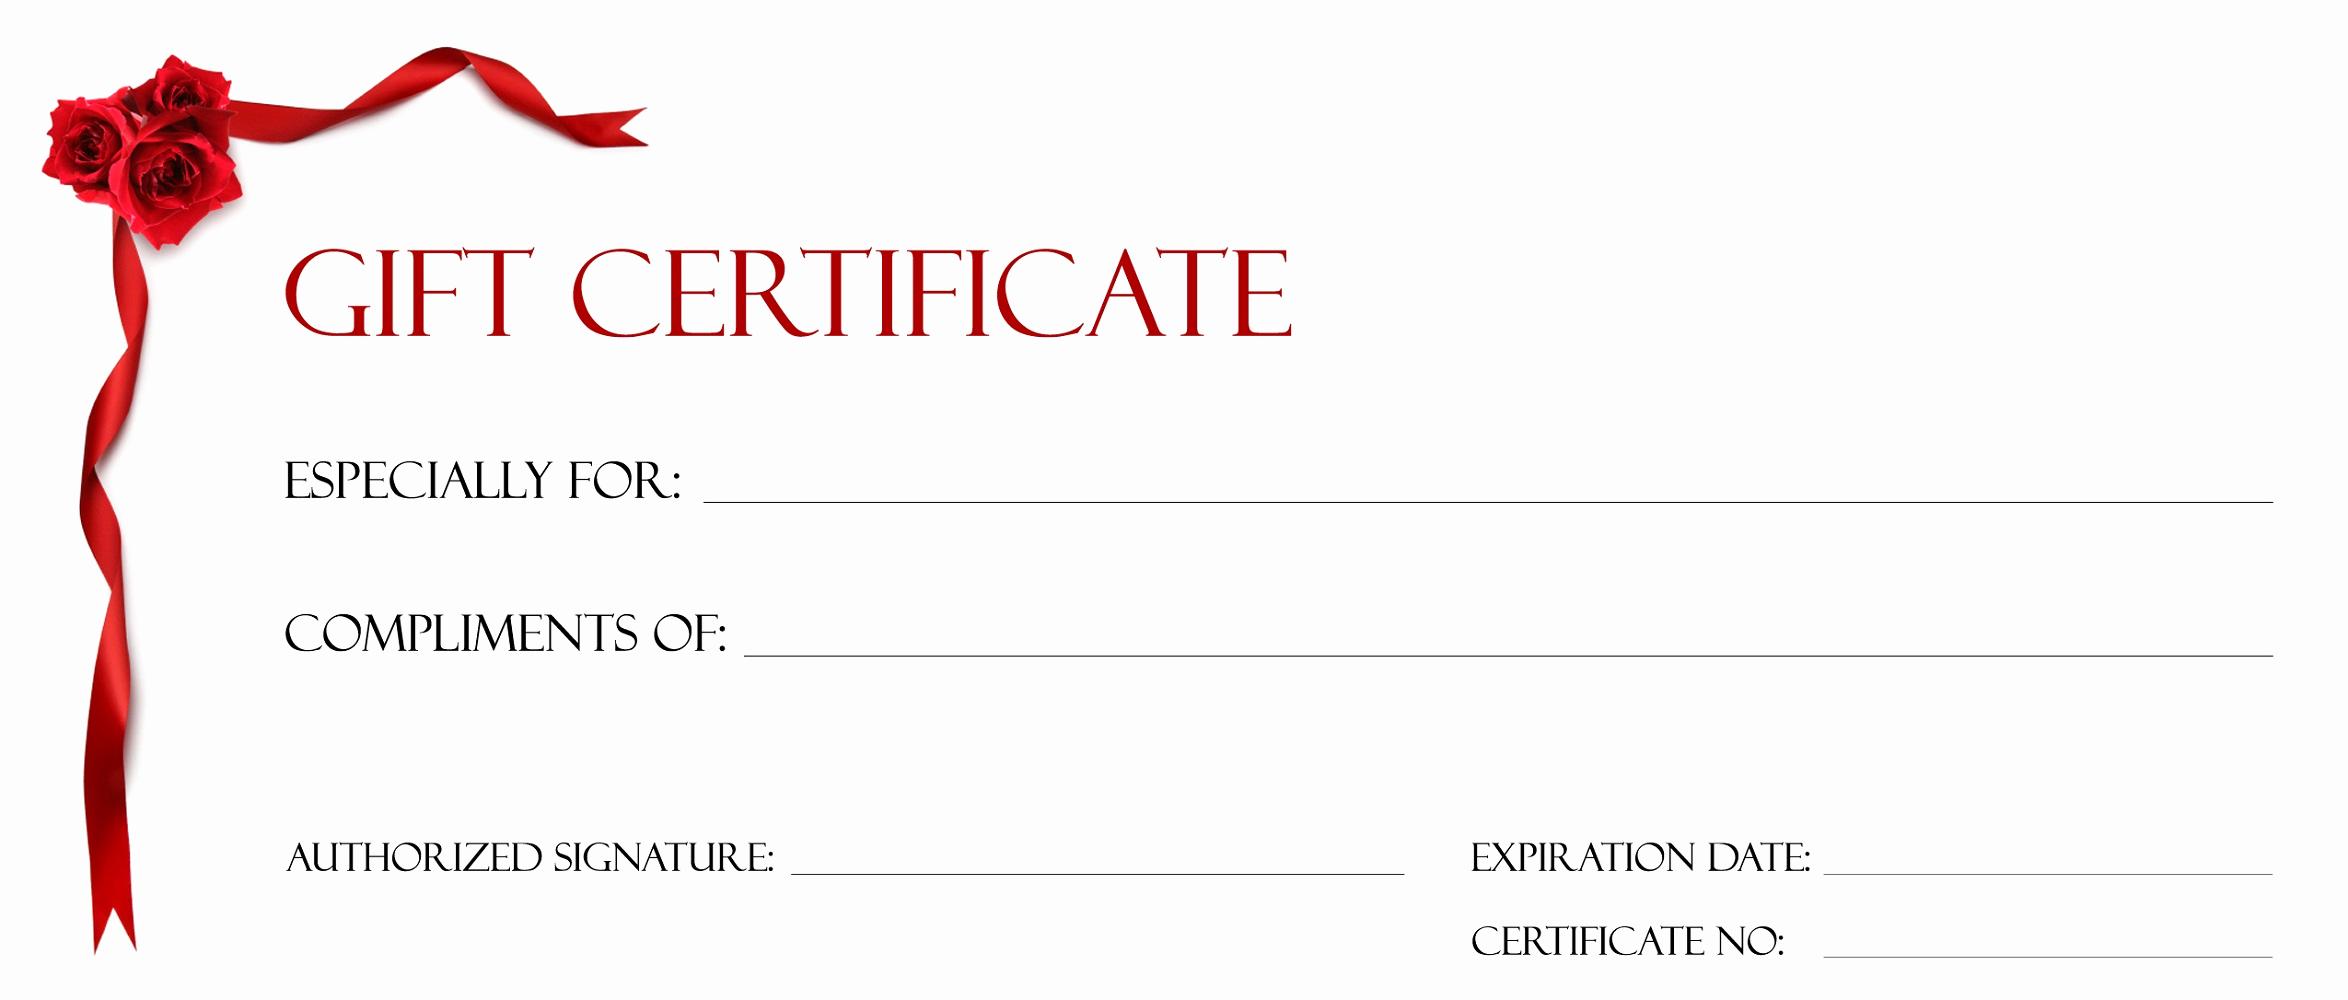 Custom Gift Certificate Template Free Fresh Gift Certificate Templates to Print